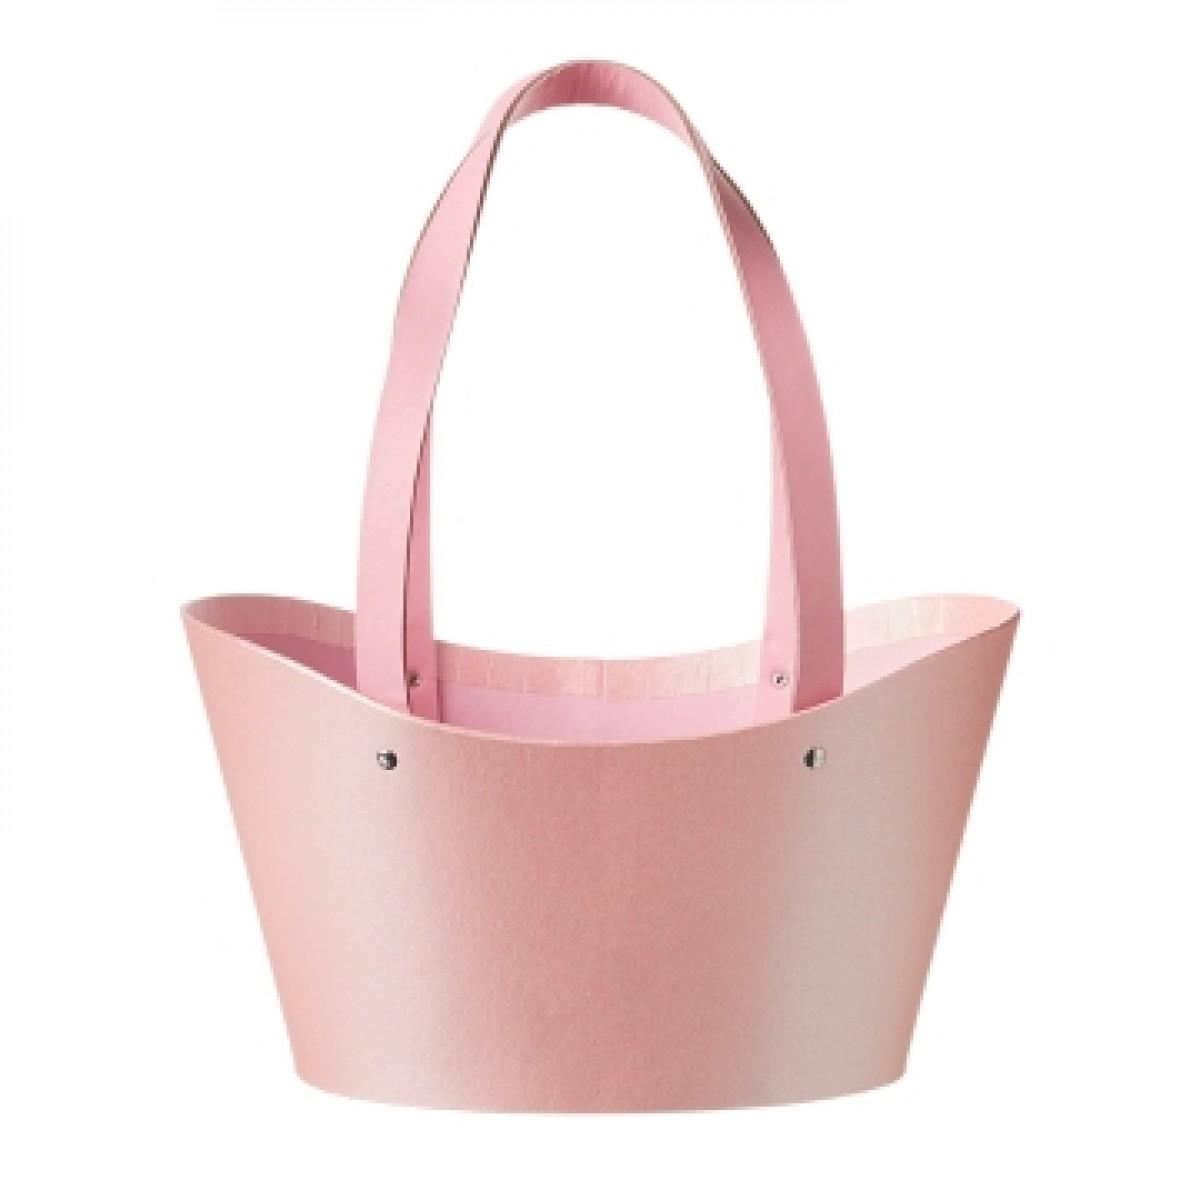 5032 Napier Basket Paper Lined Pink (Pack of 3)